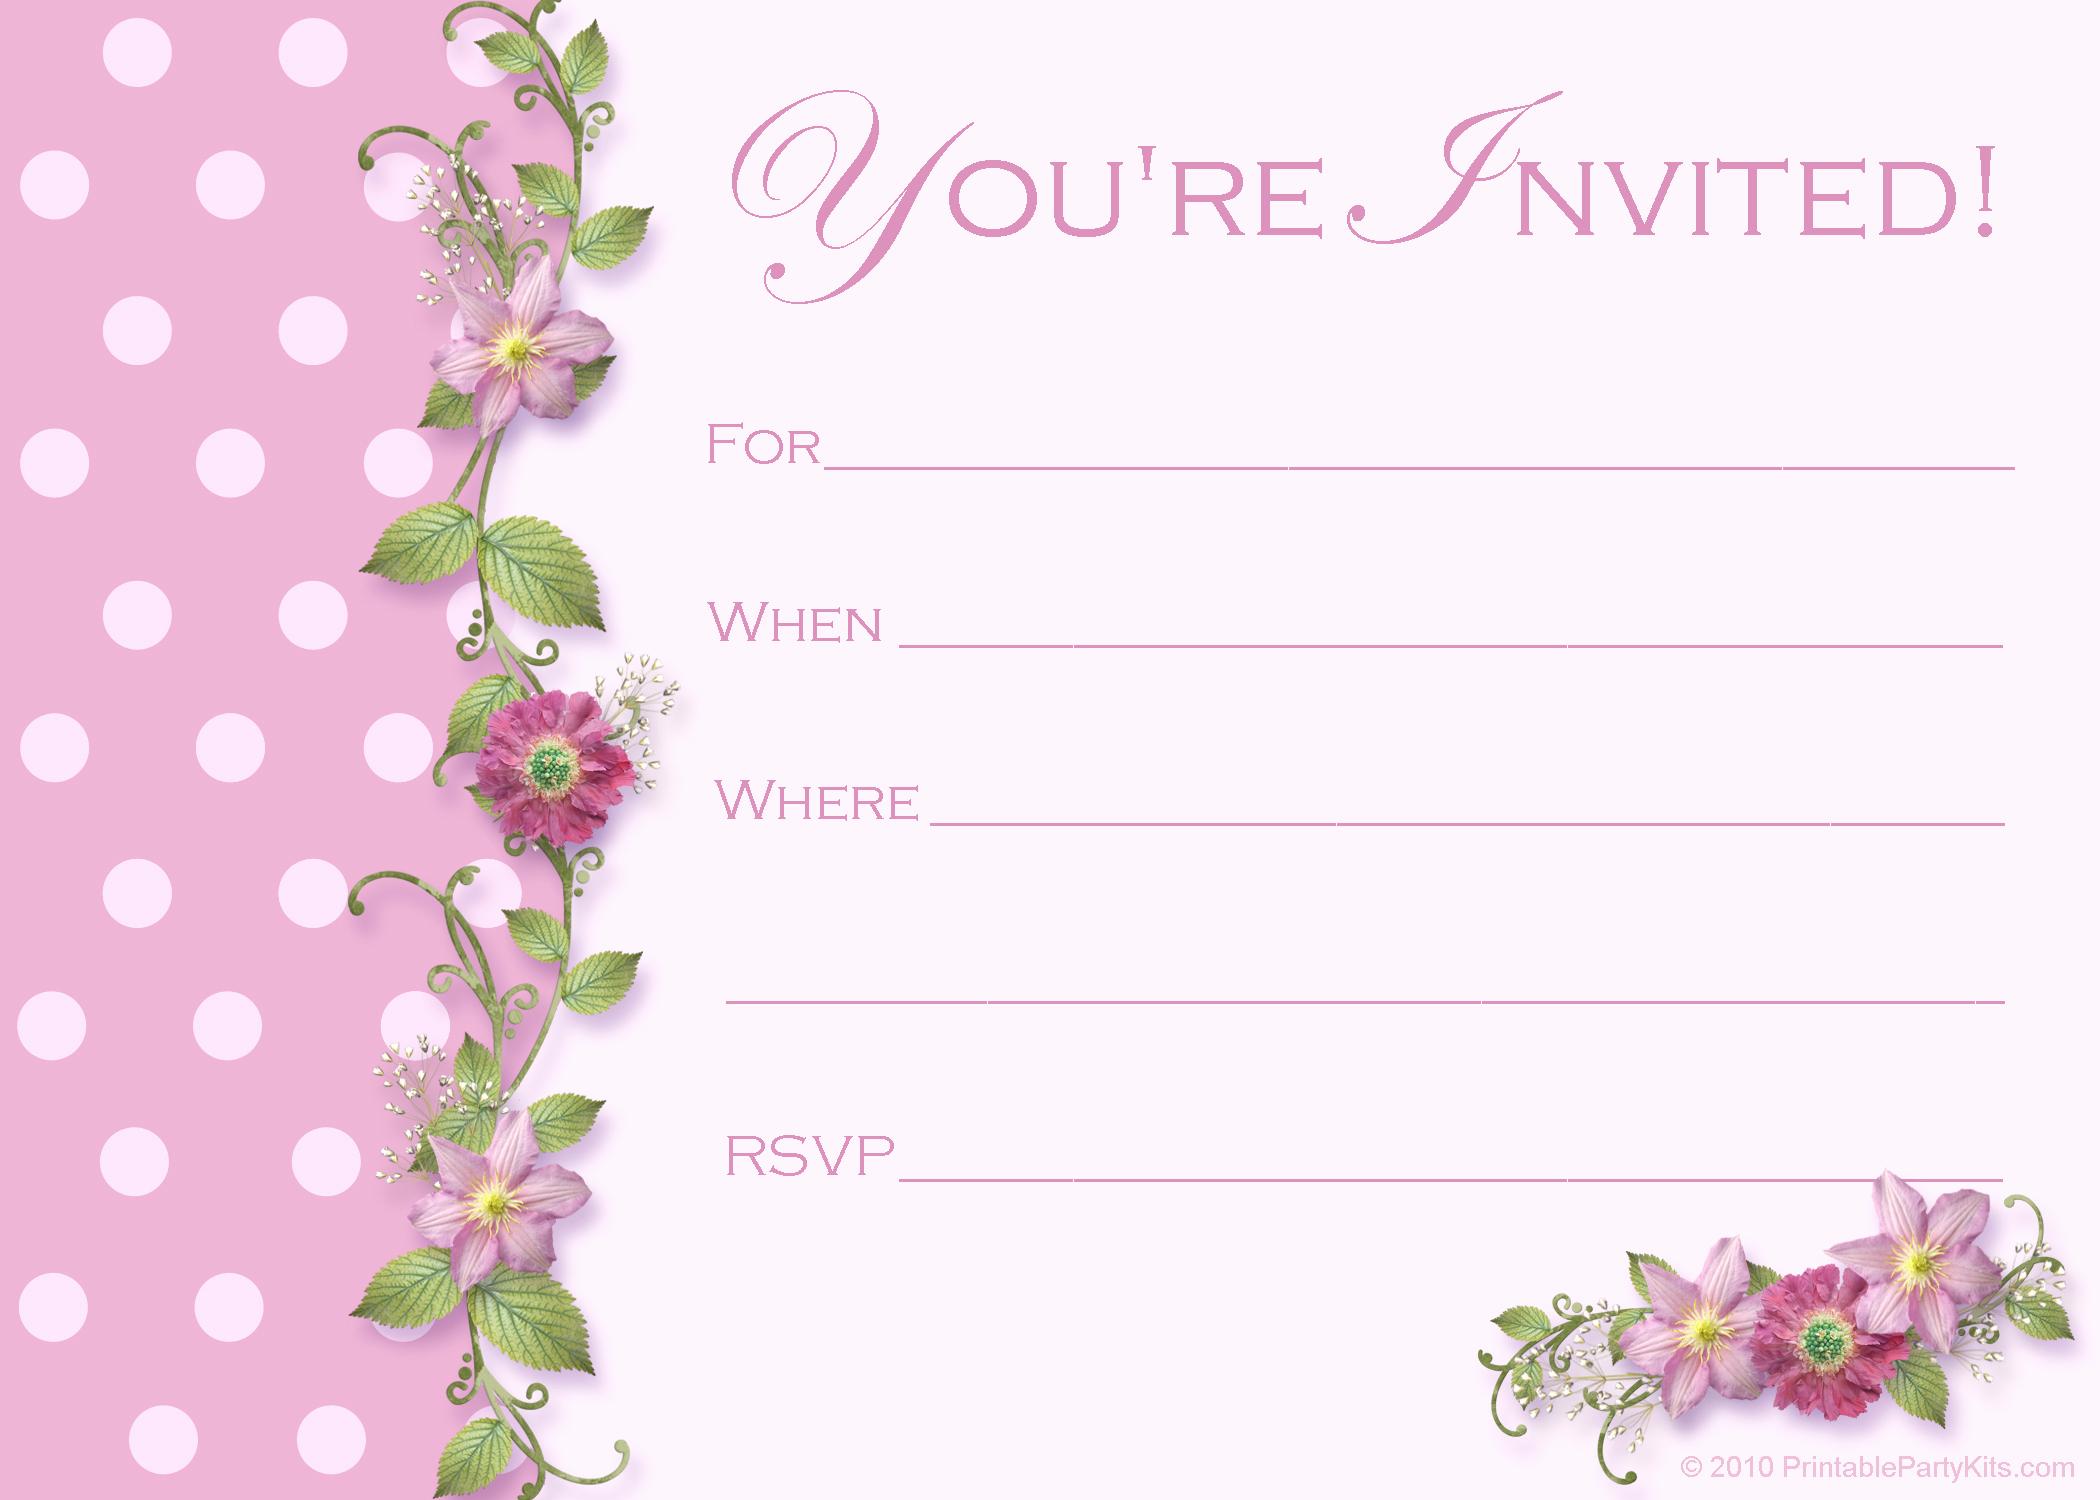 Free Online Invitation Templates Inspirational Free Sweet 16 Birthday Invitations – Free Printable